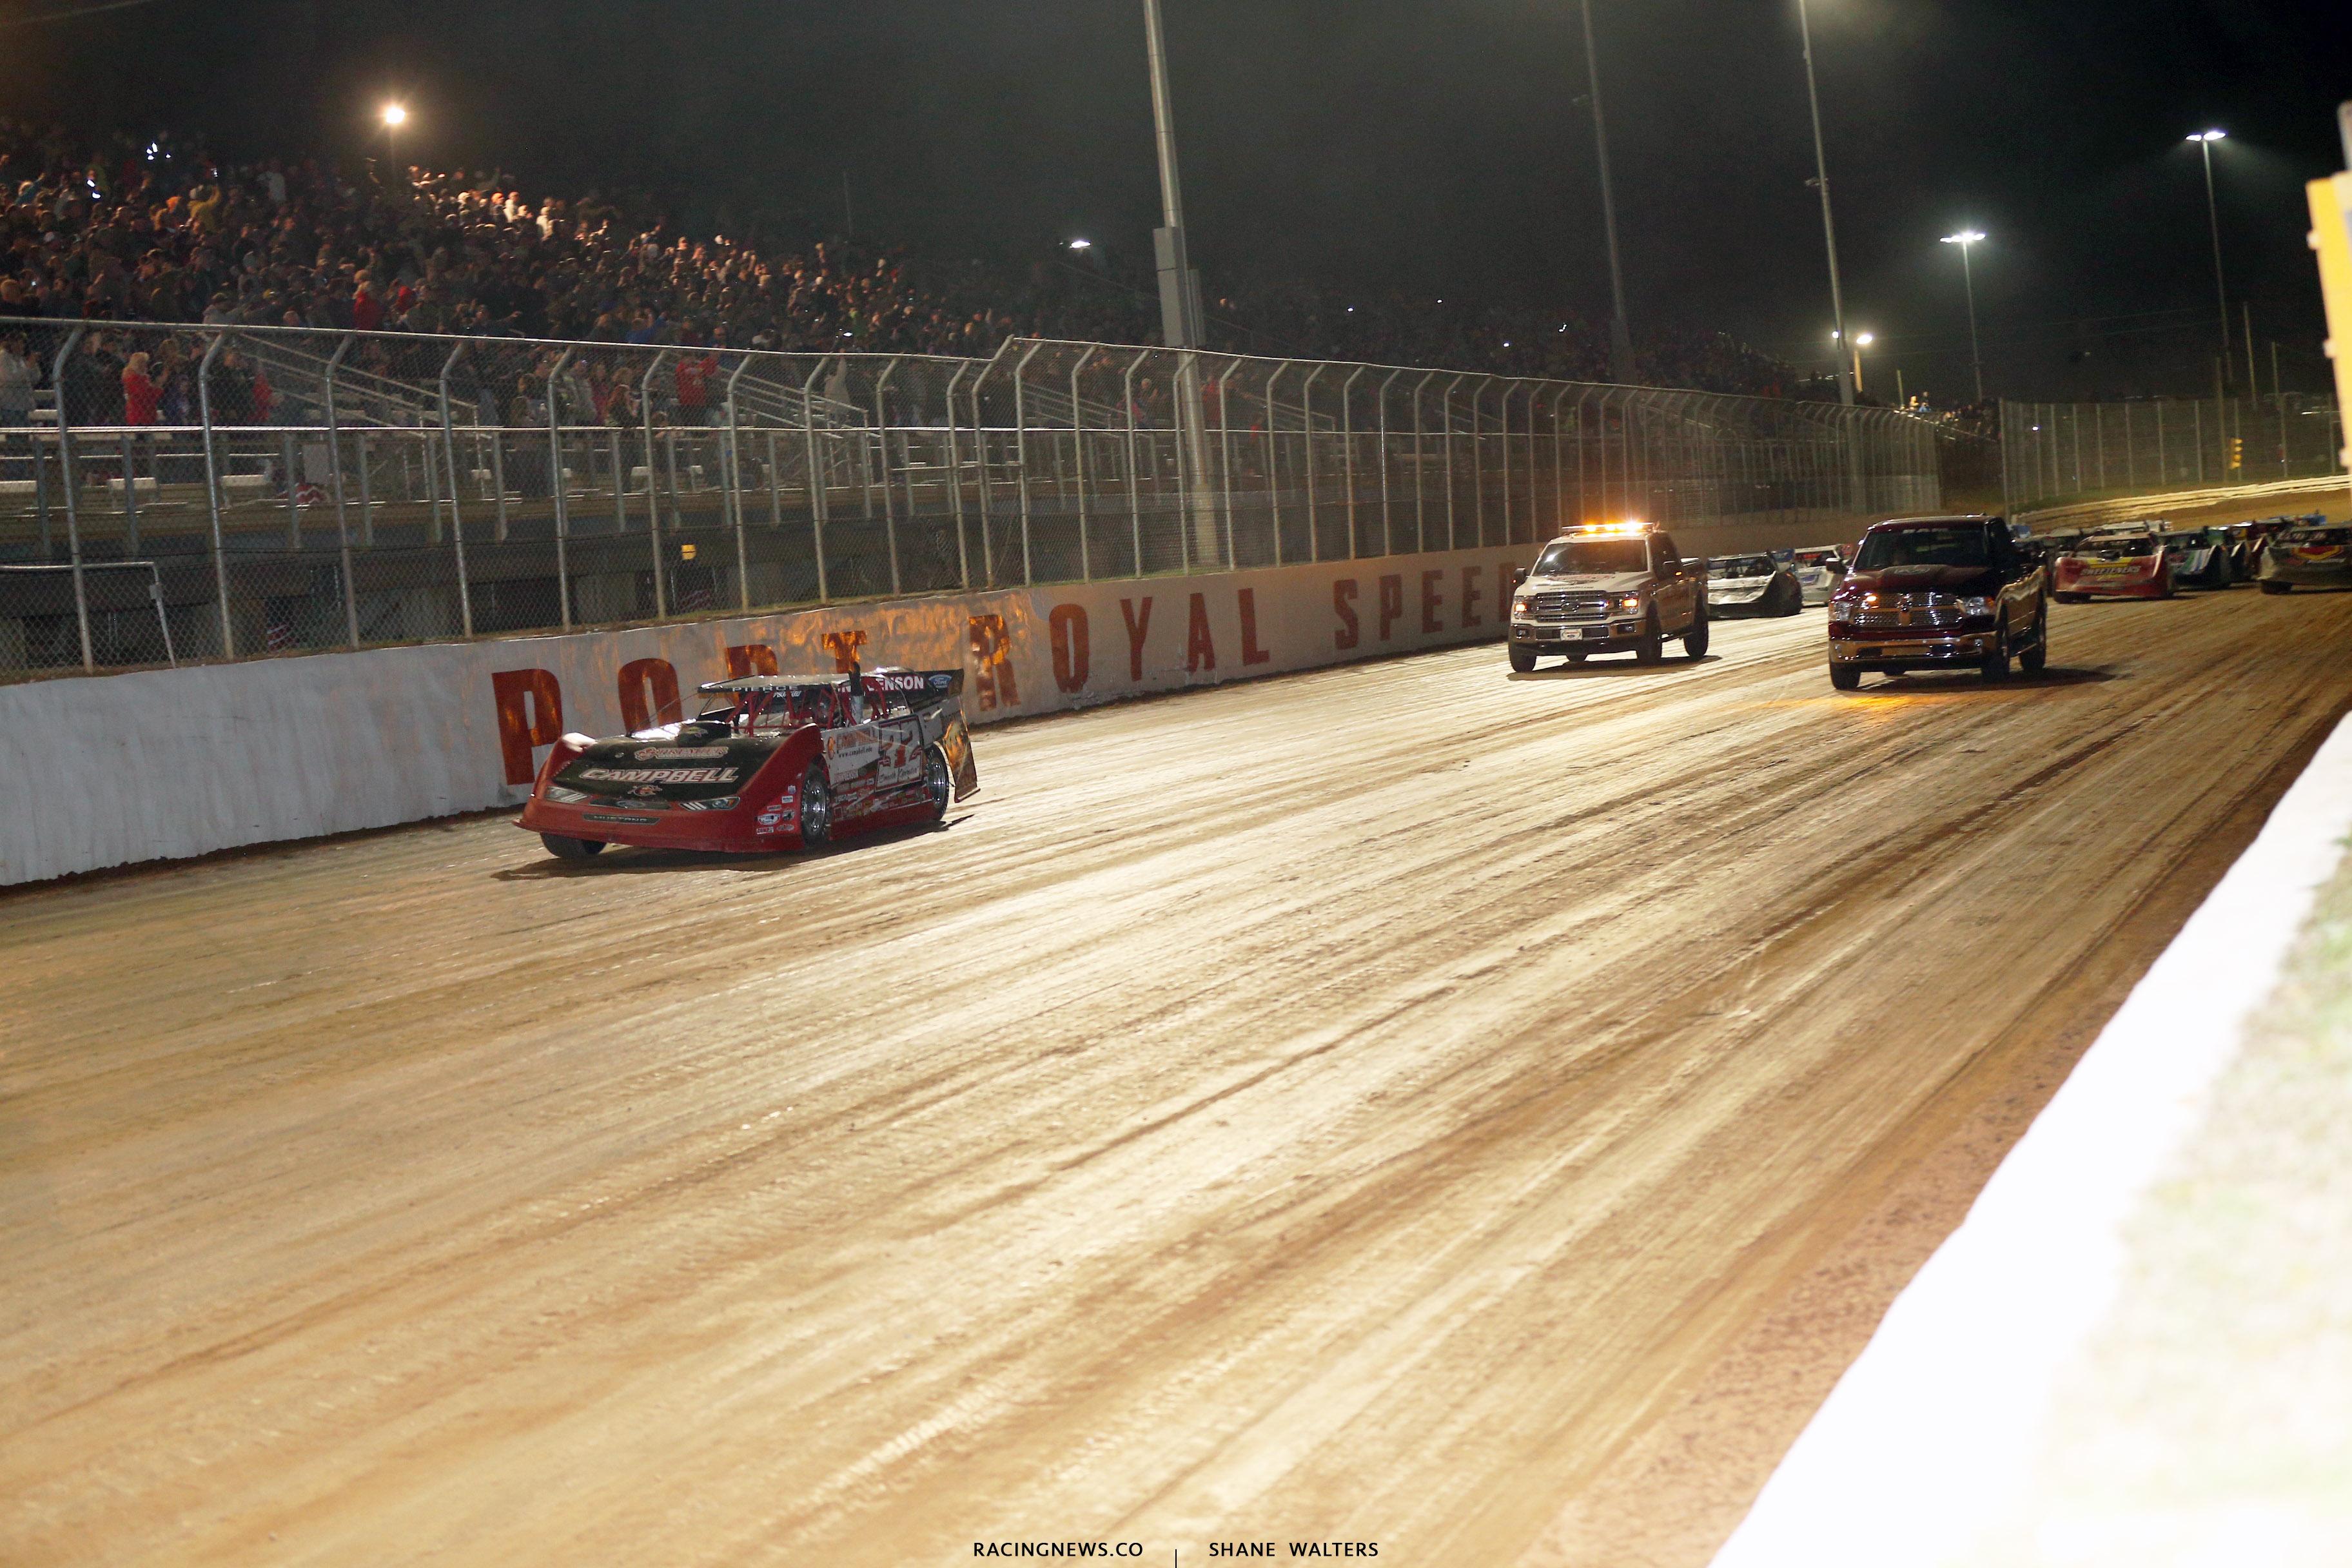 Carlton Lamm 4 wide salute - Tribute at Port Royal Speedway